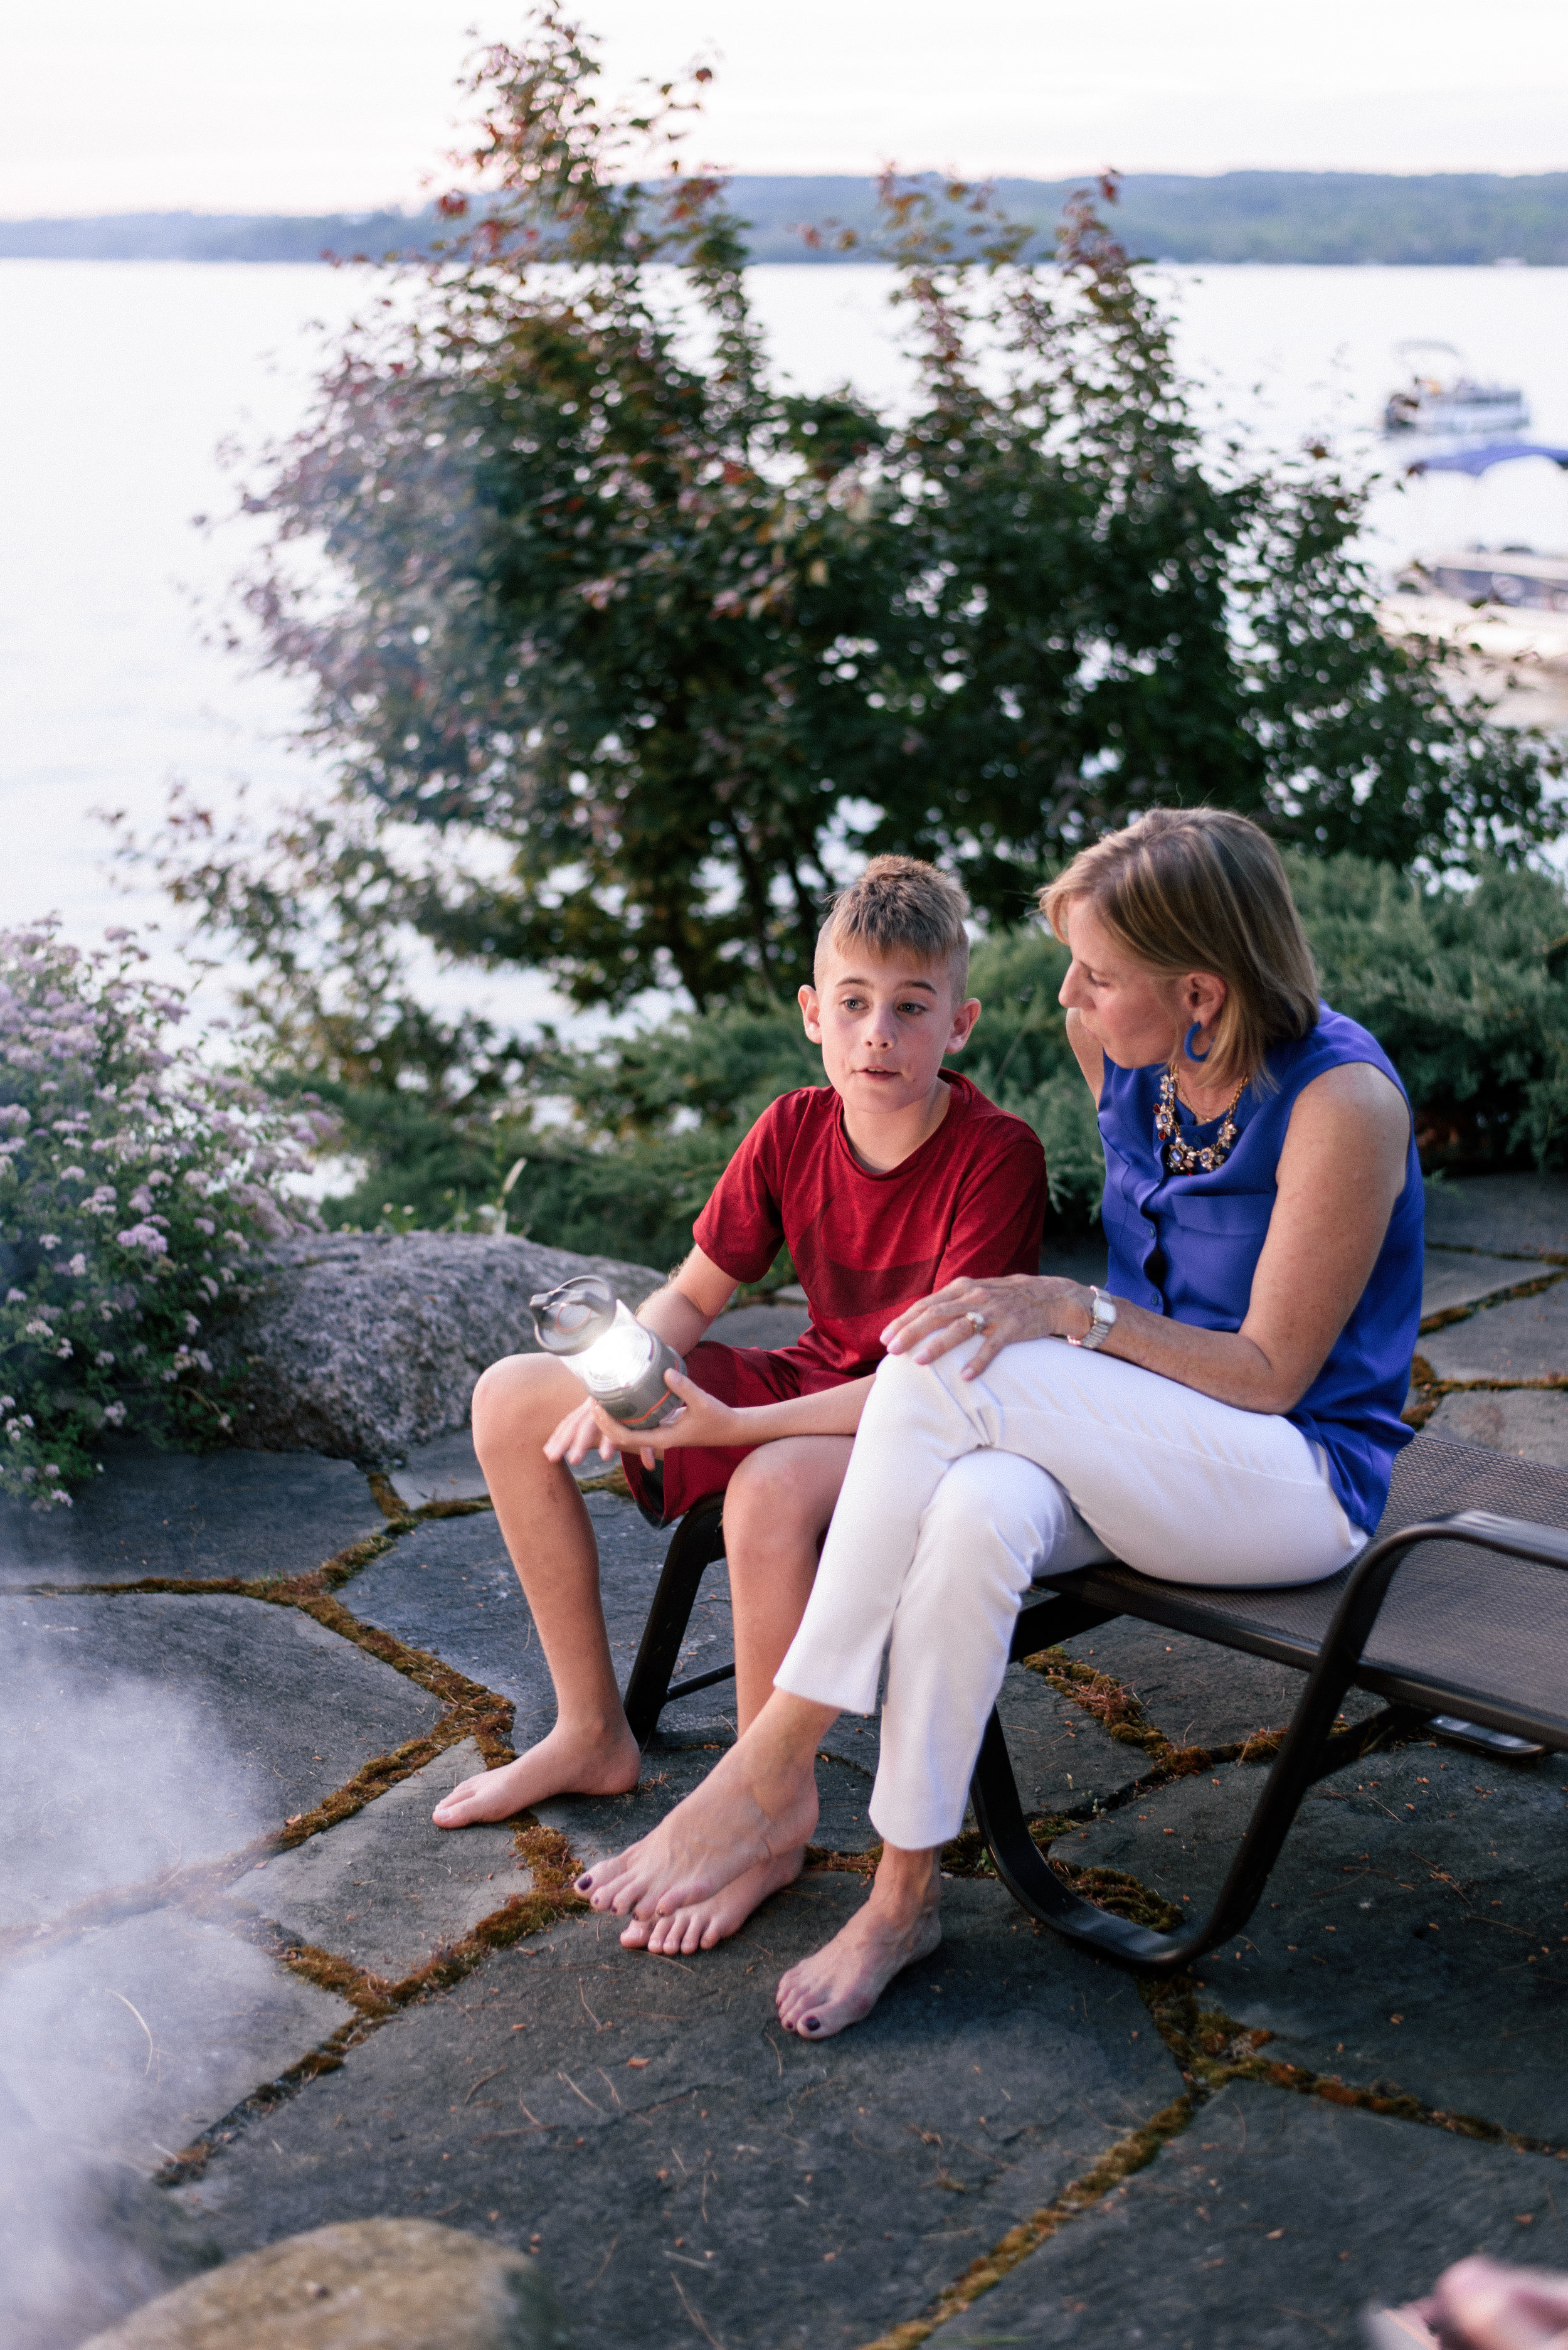 Best Summer Activity Ideas for Kids